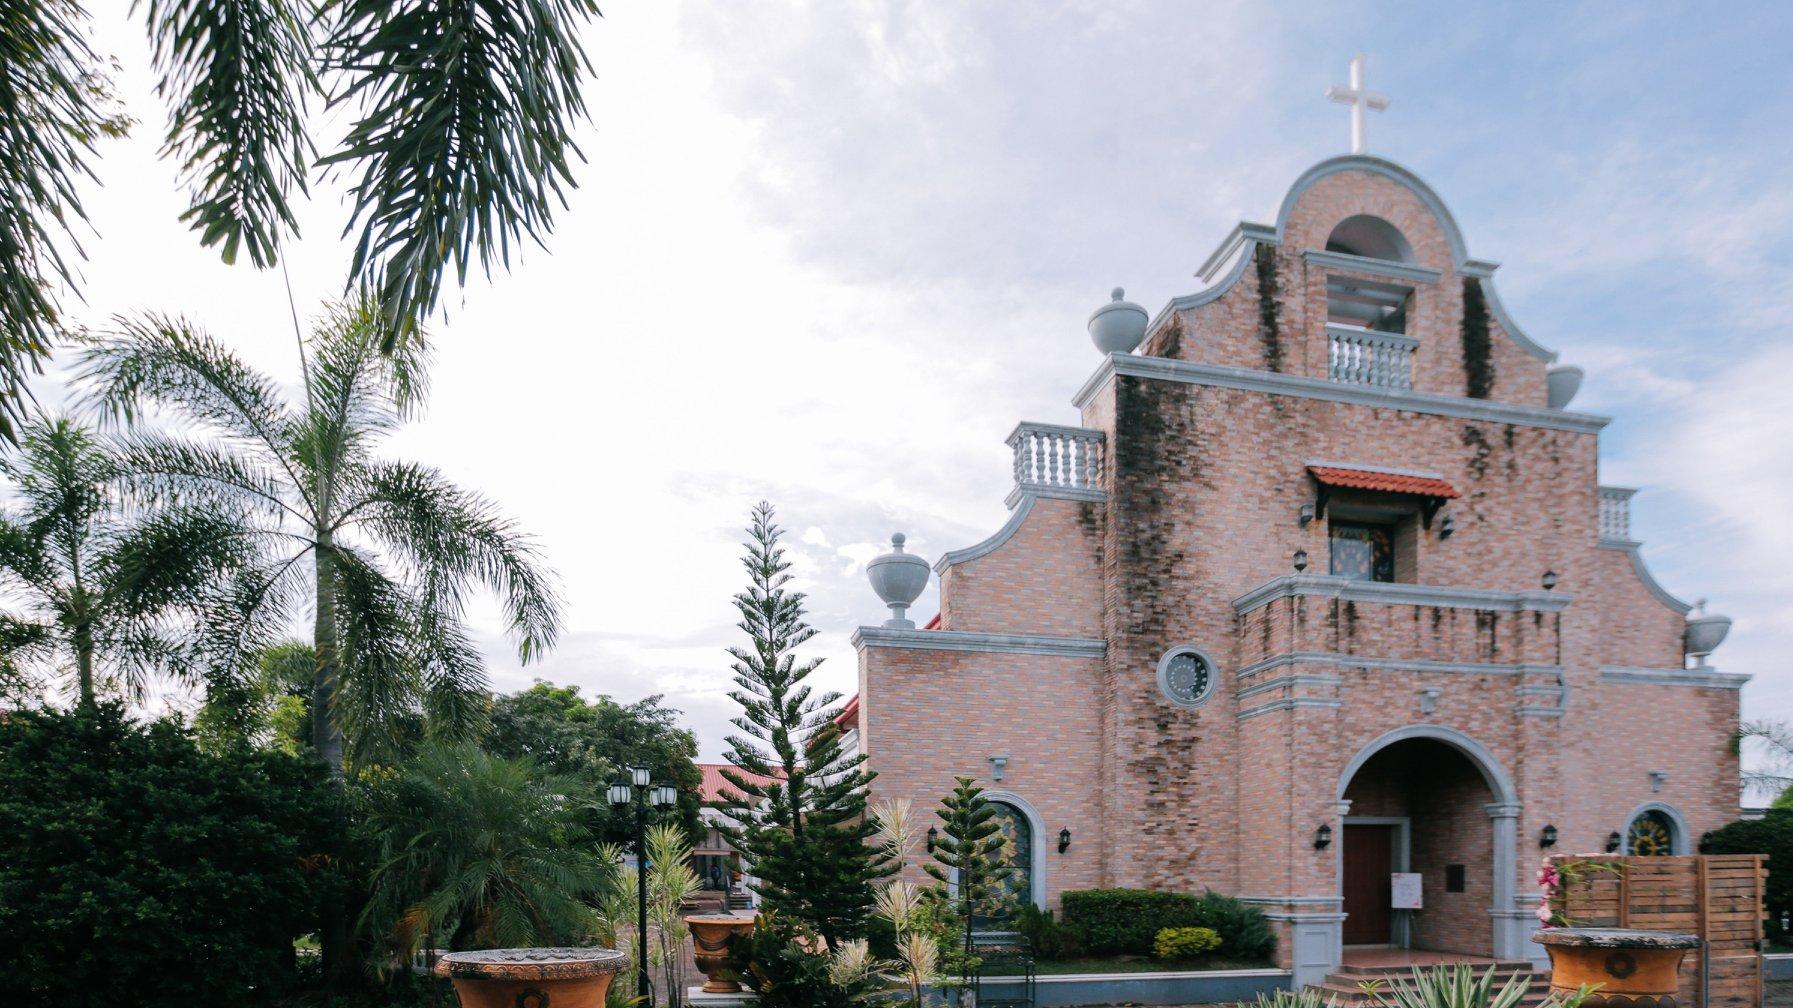 Arzobispado de Pampanga (Chancery)